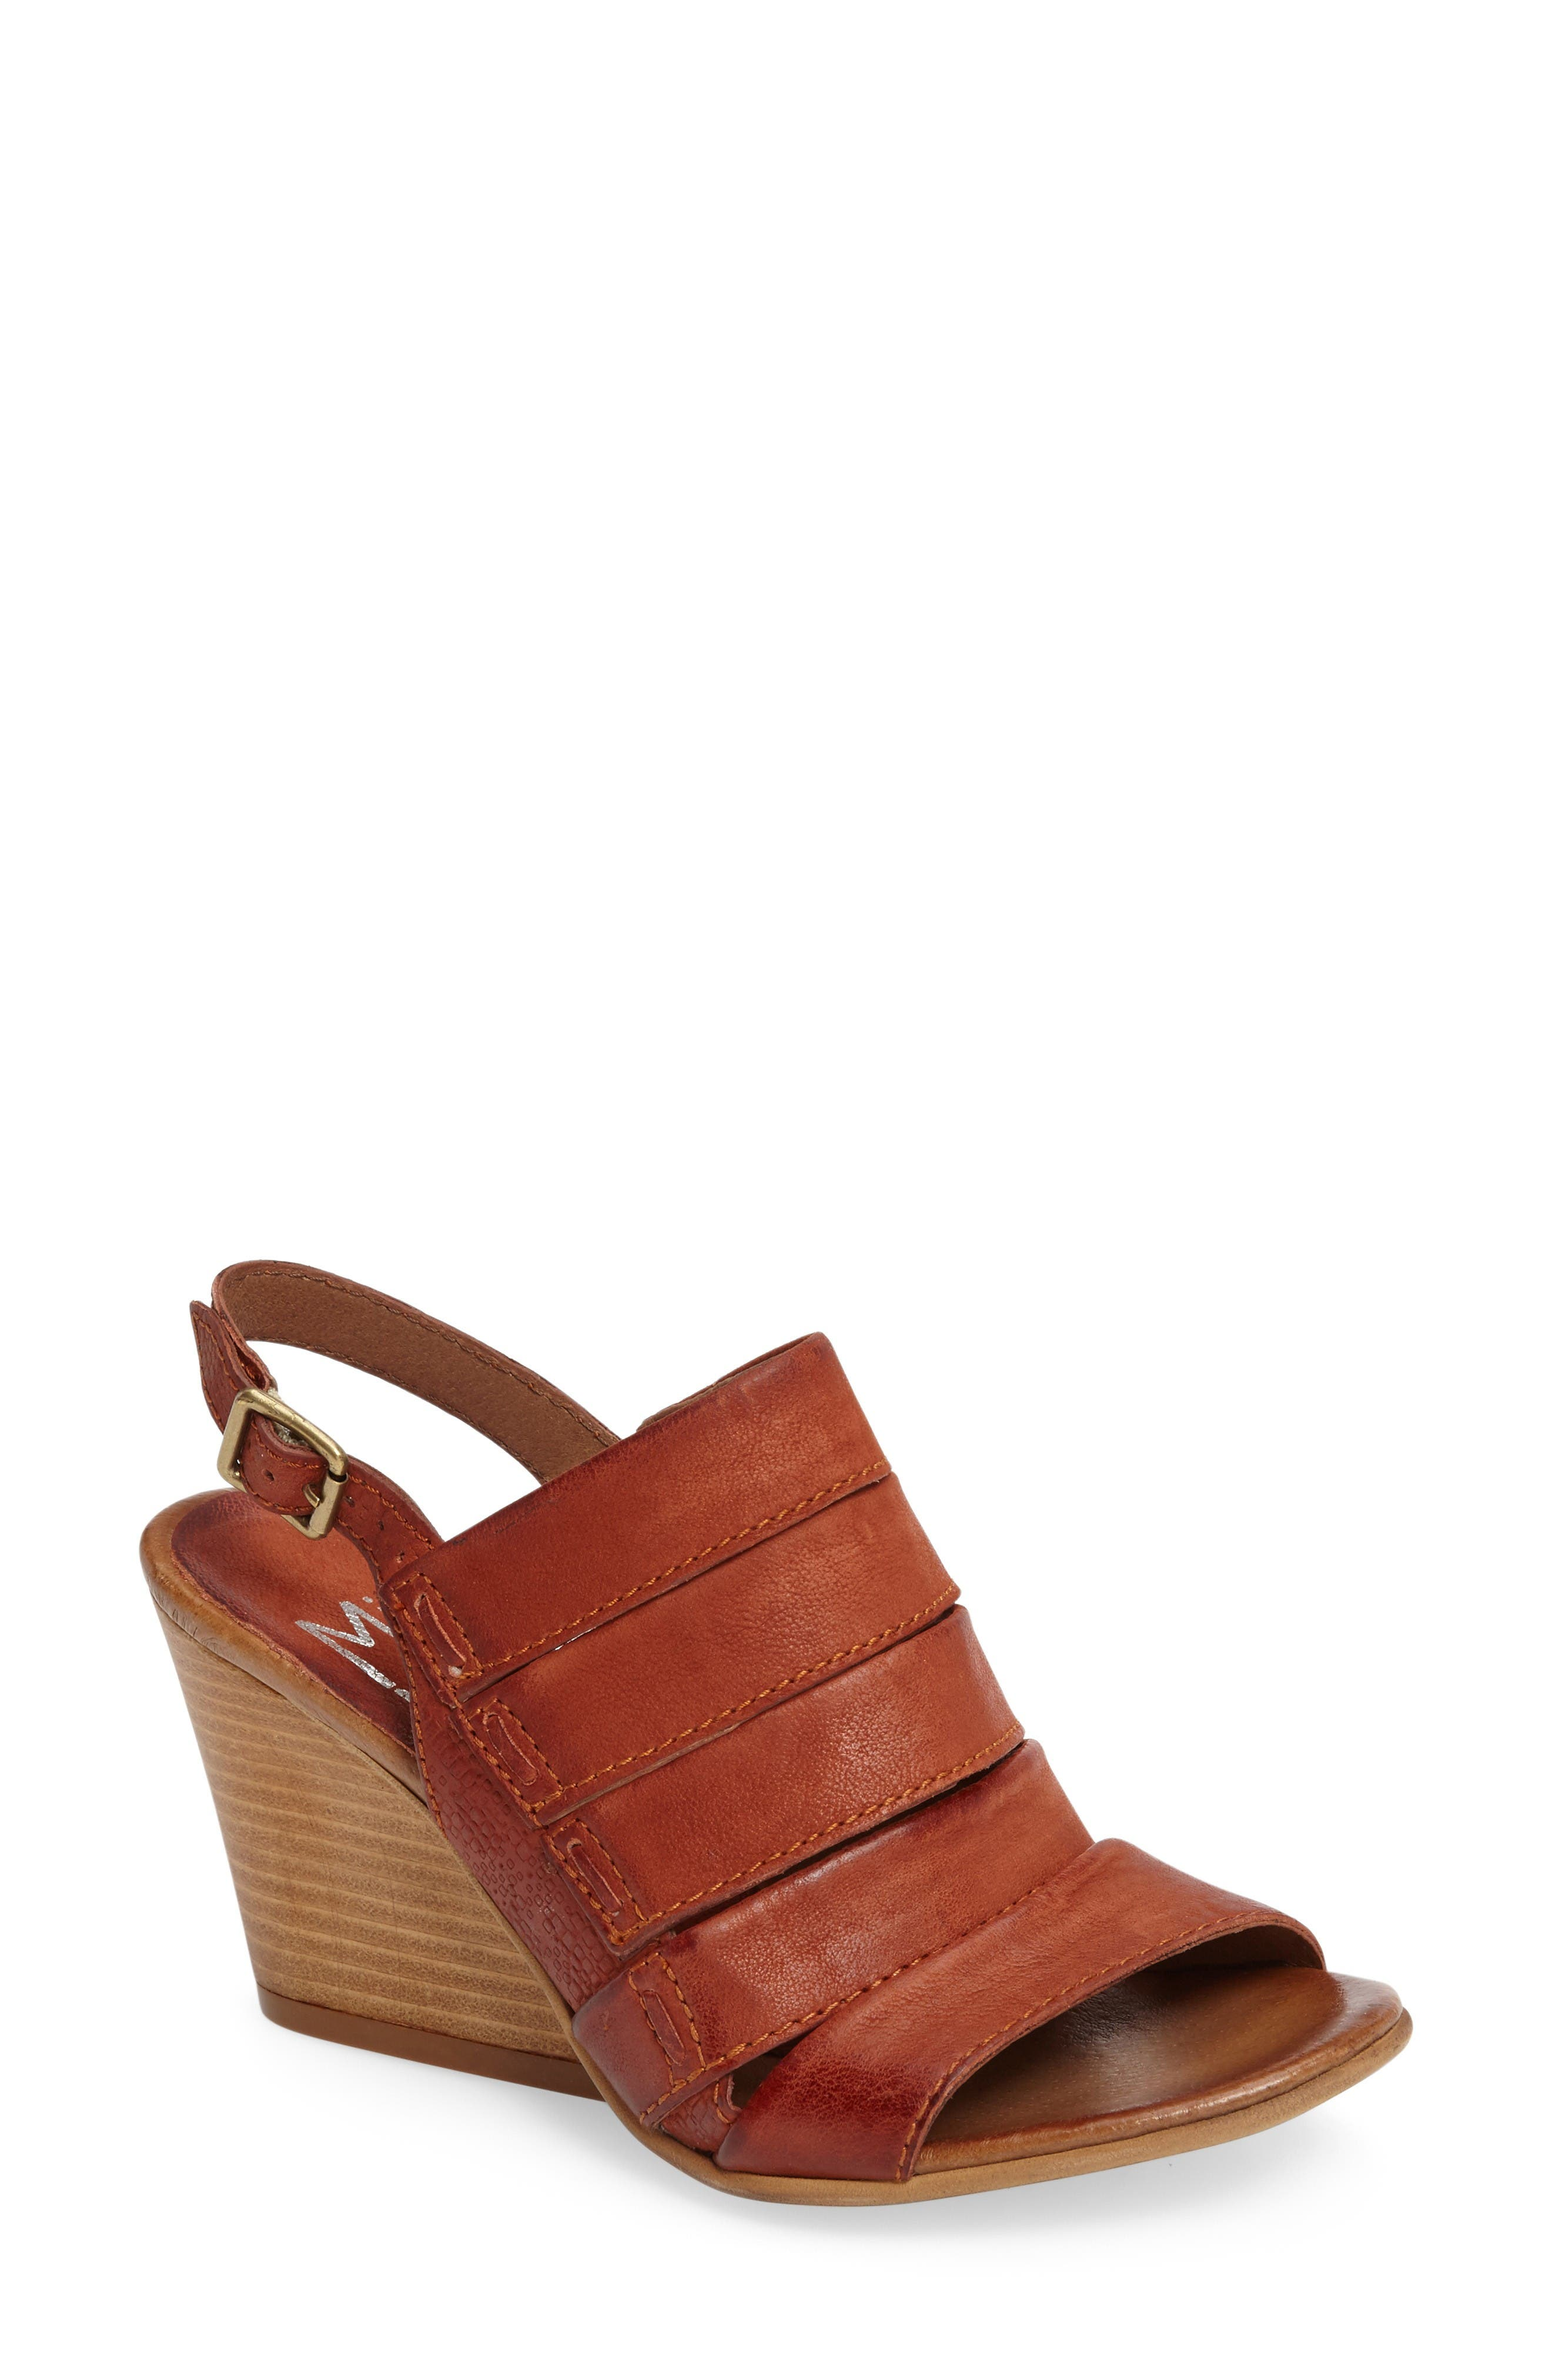 Alternate Image 1 Selected - Miz Mooz Kenmare Wedge Sandal (Women)